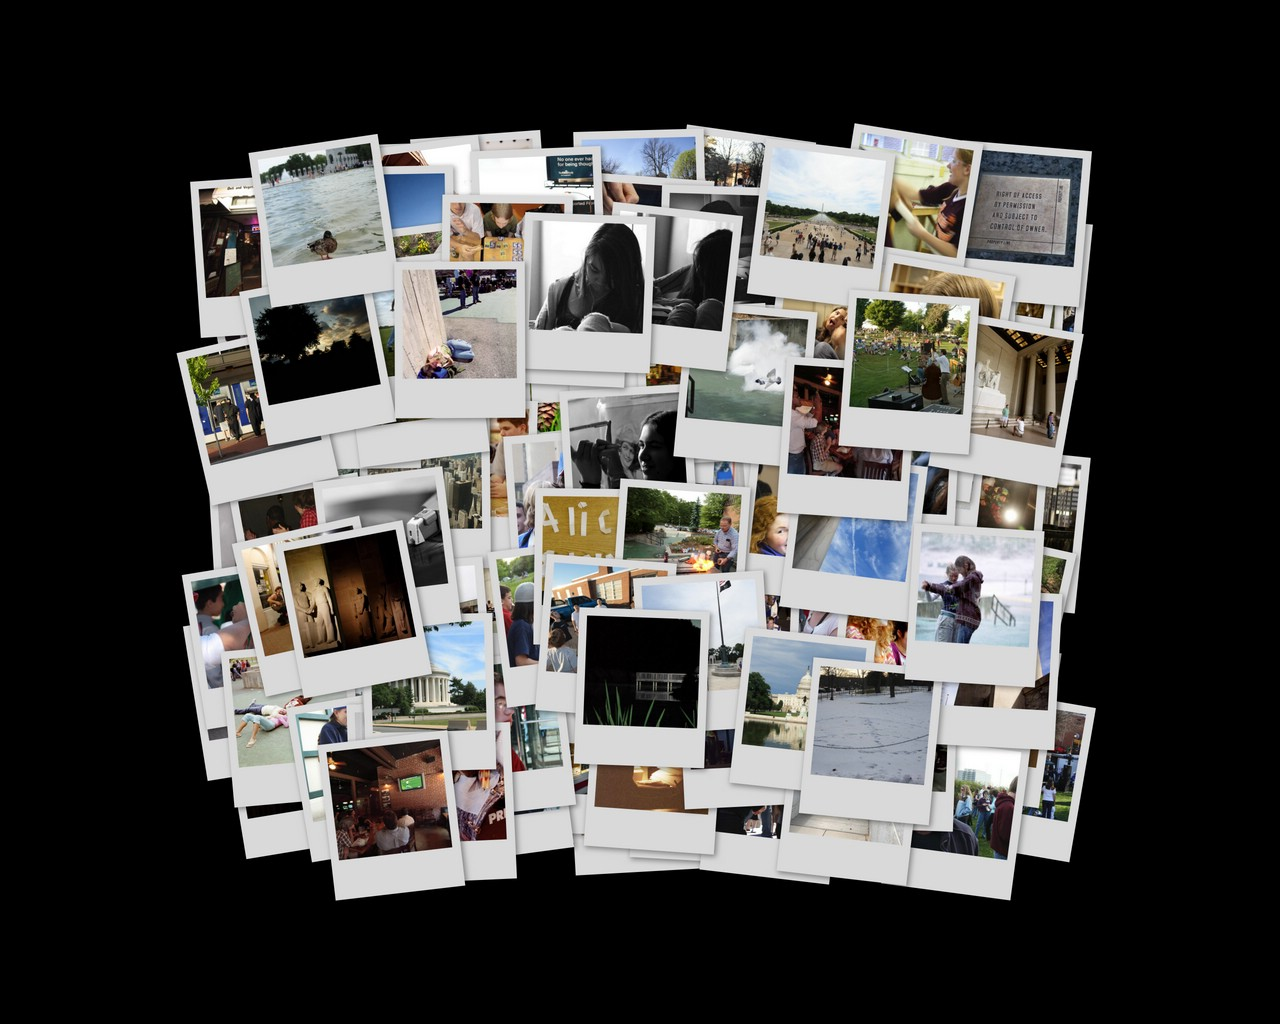 collage_Daniel Lin (via Flickr)_CC BY-SA 2.0